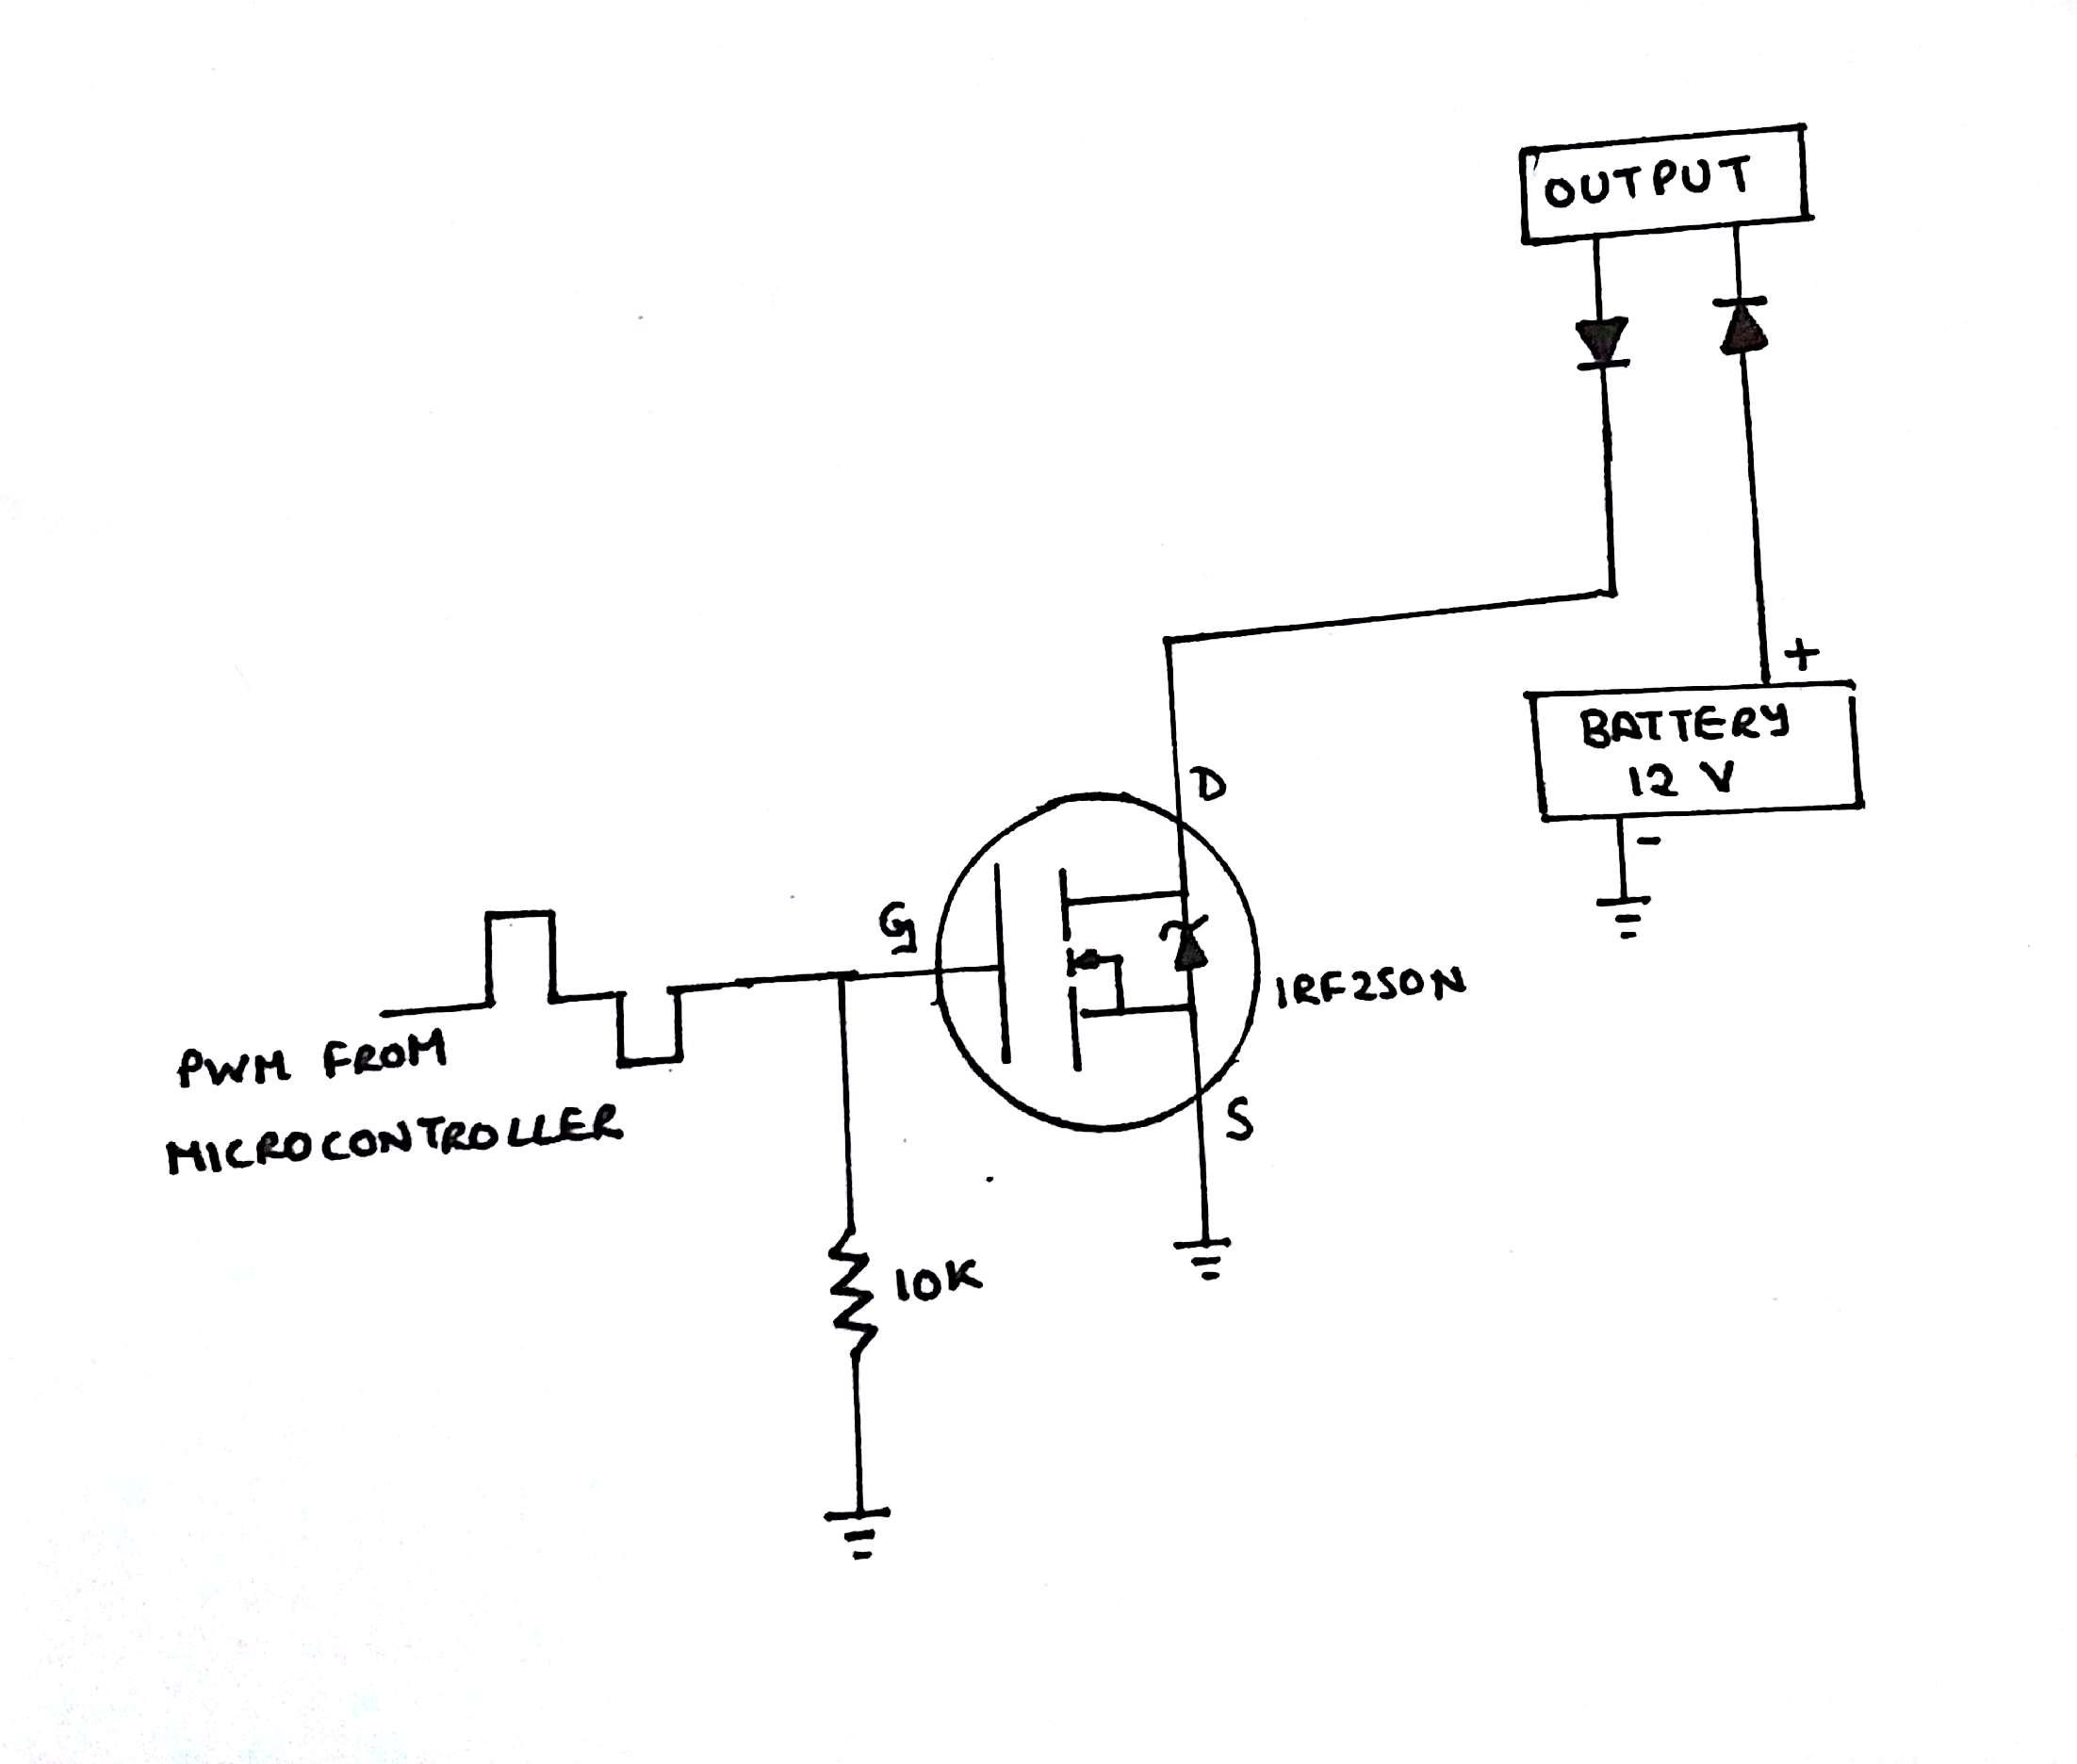 Picture of PWM INTERPRETER CIRCUIT